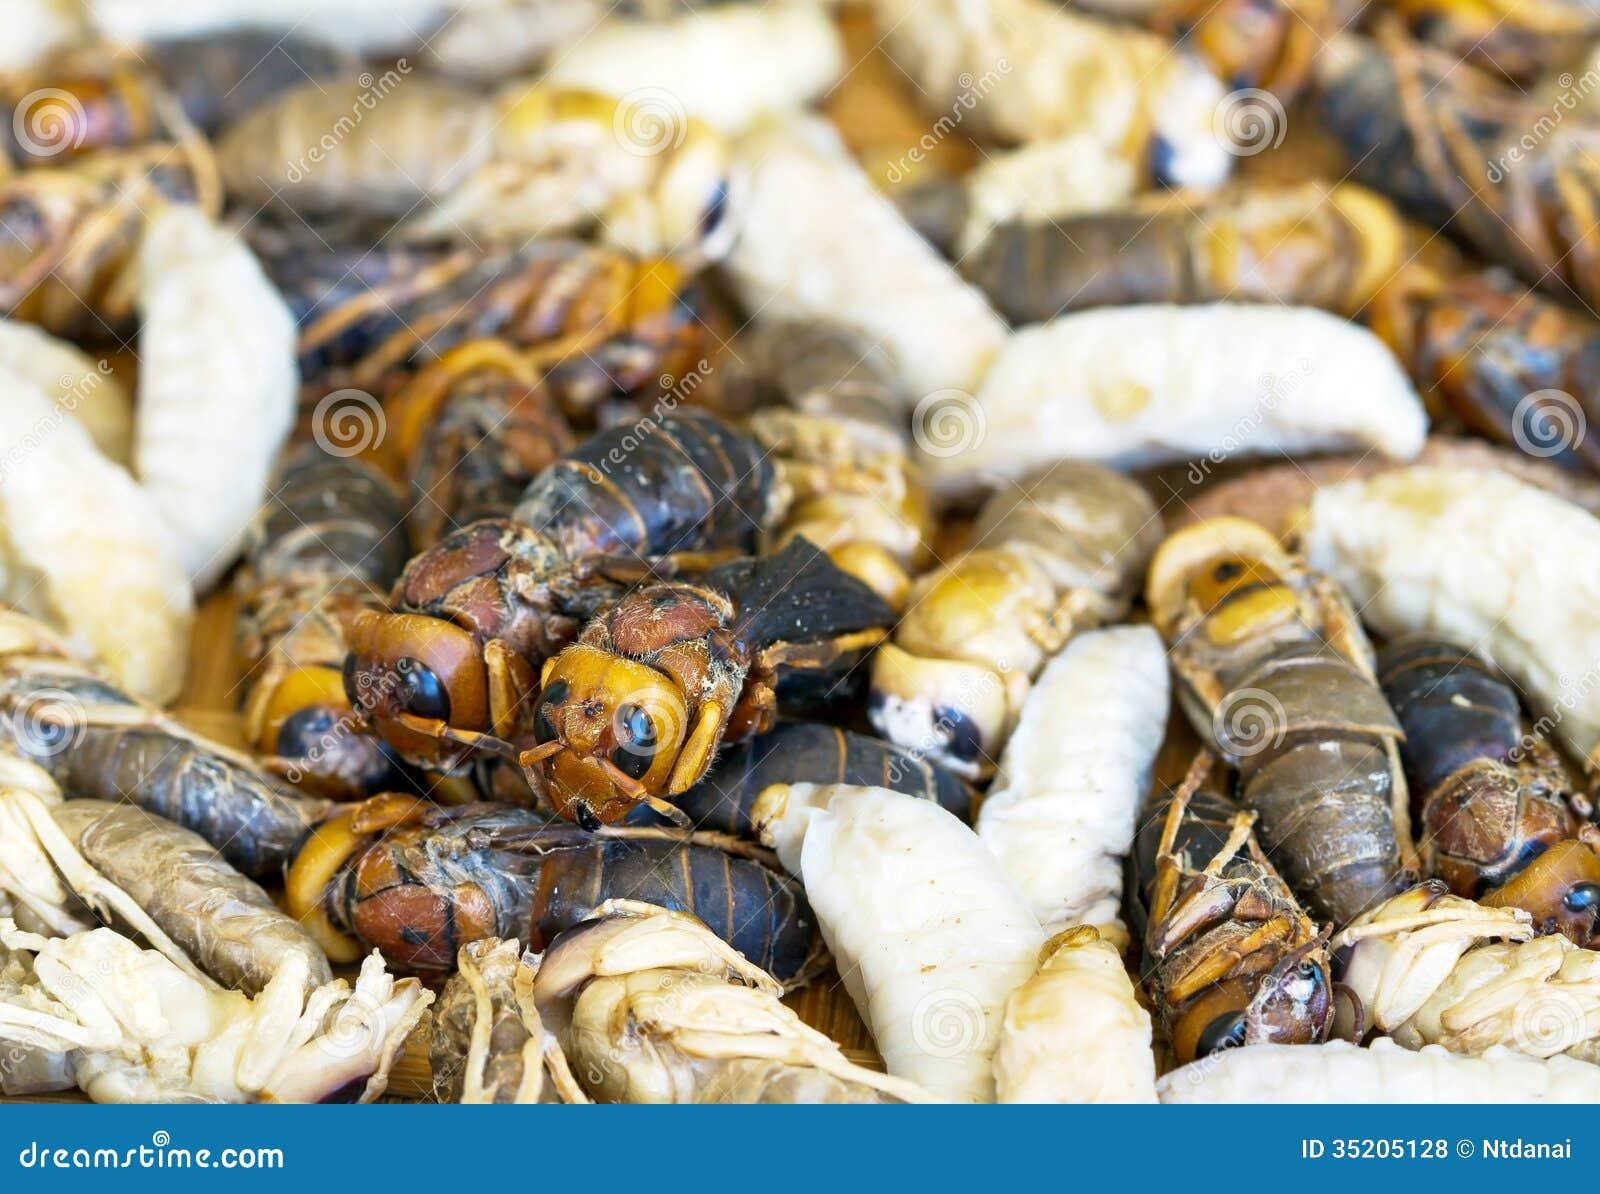 Личинка пчелы